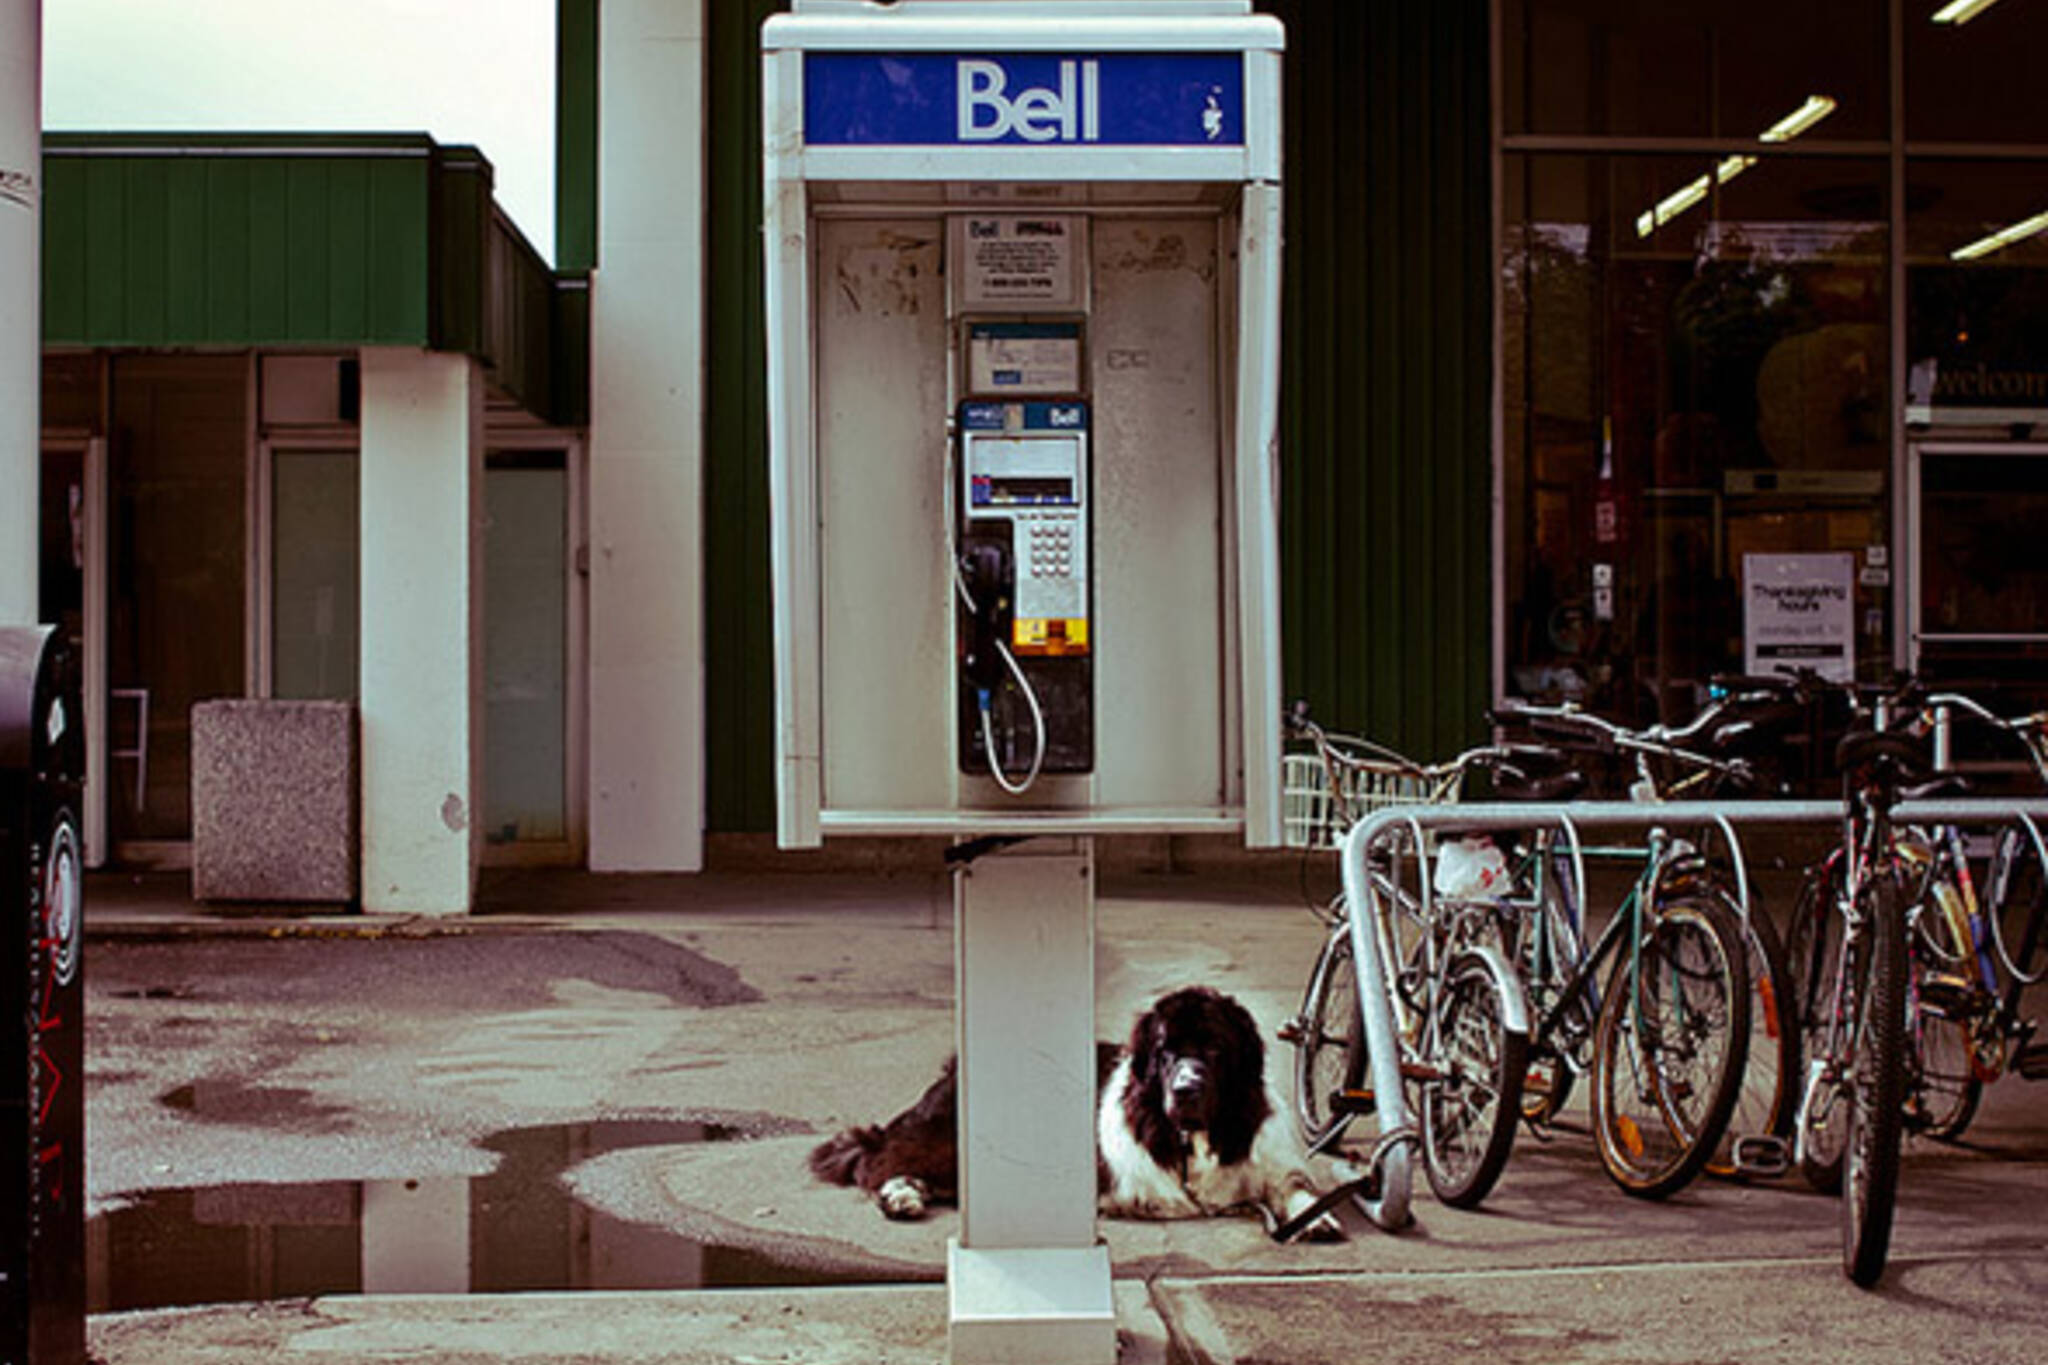 dog, phone, booth